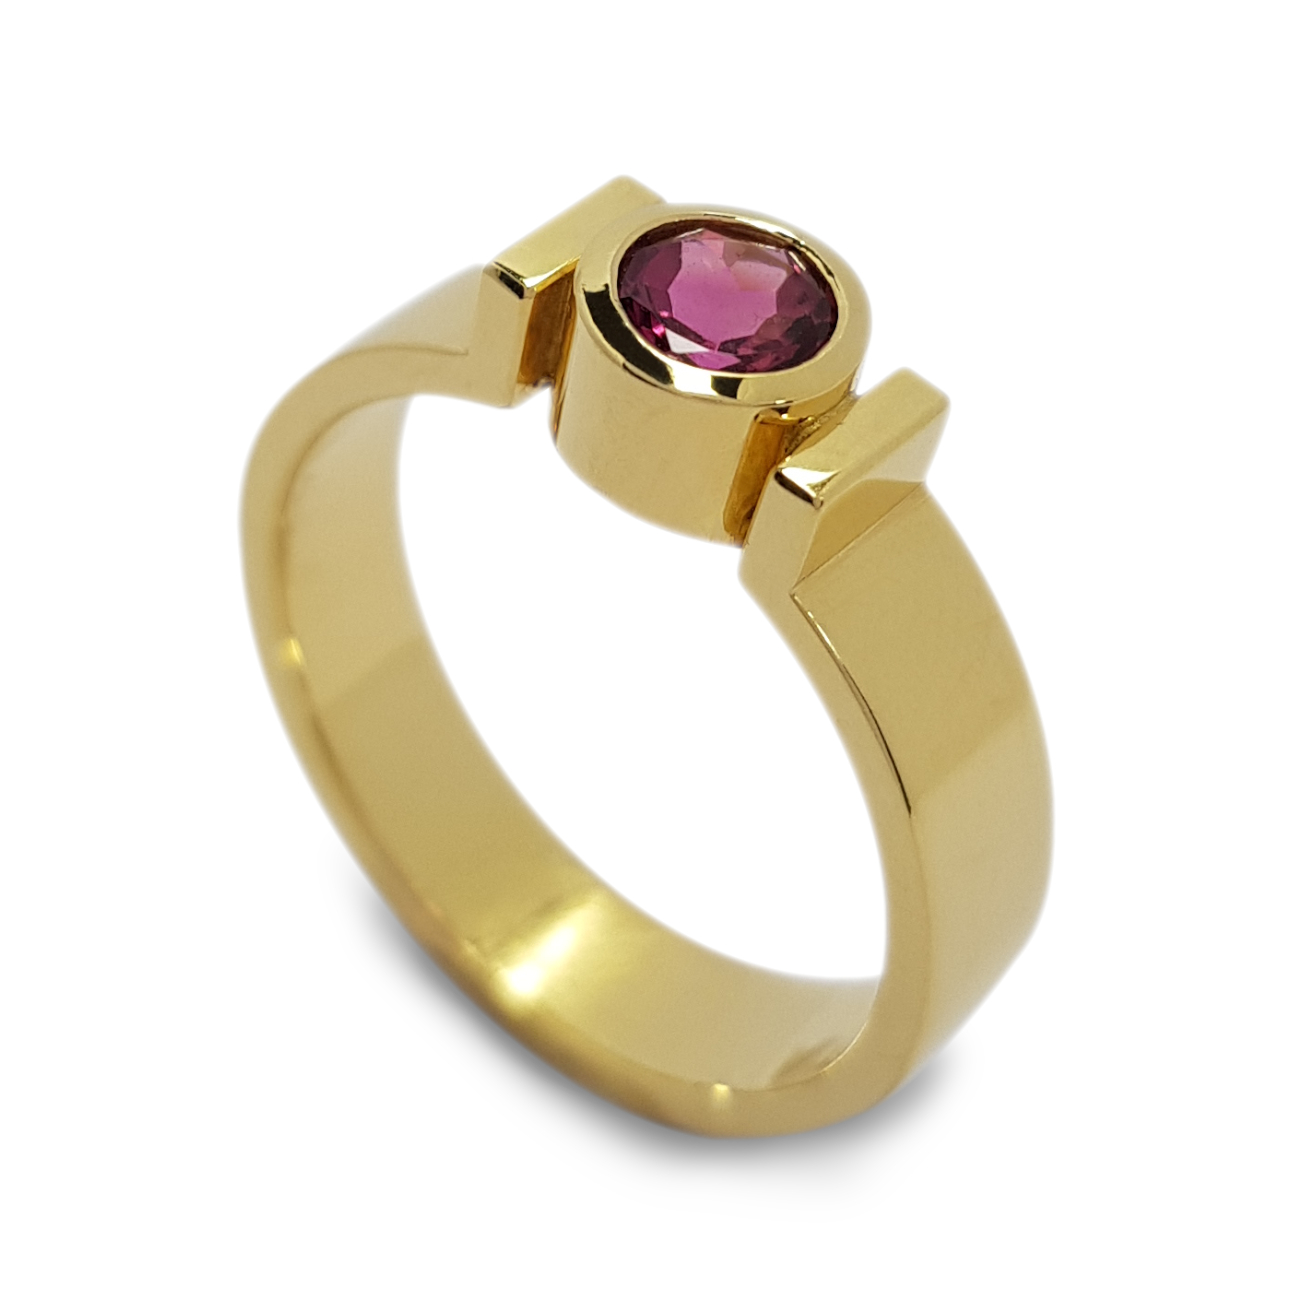 Rudolf Heltzel bezel set solitaire diamond engagement ring